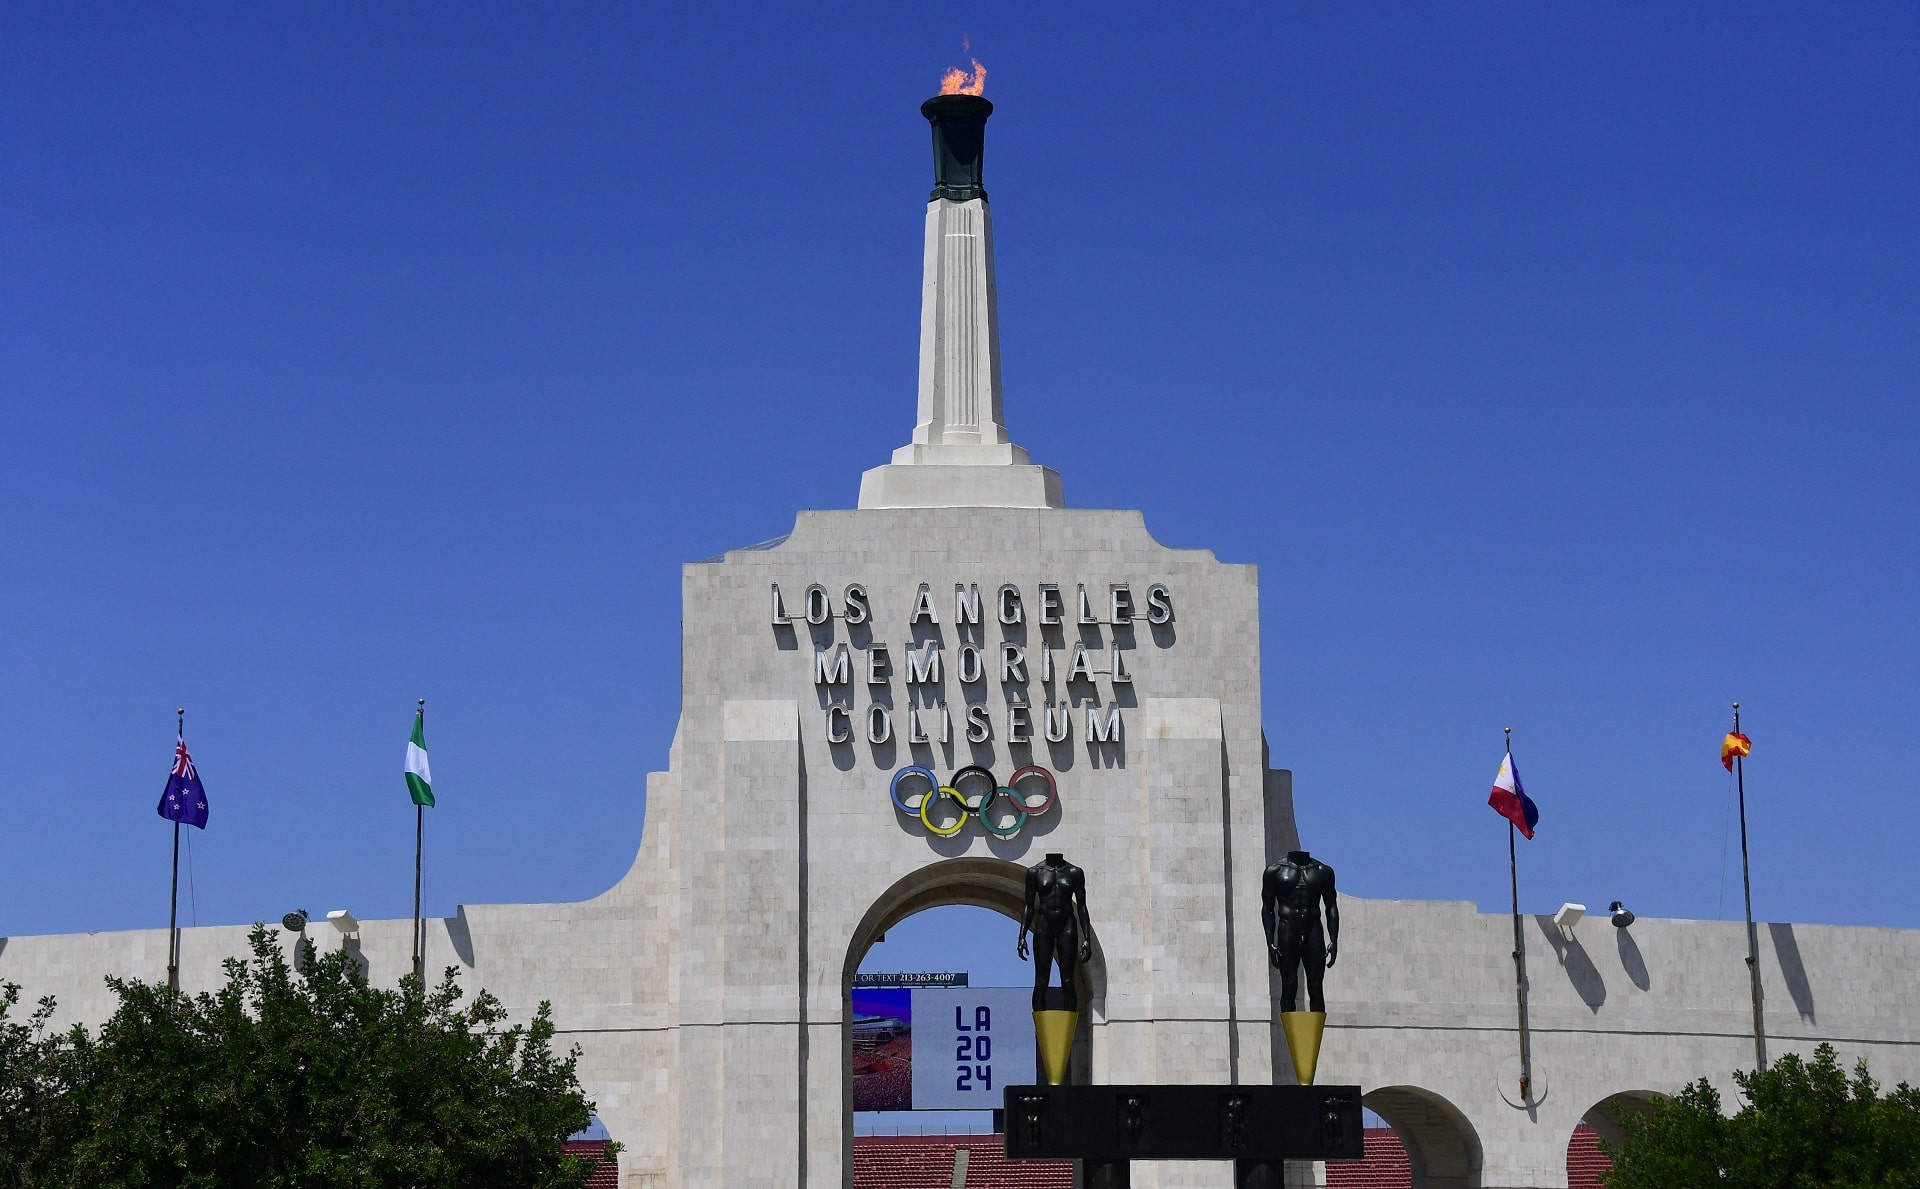 The Los Angeles Memorial Coliseum.